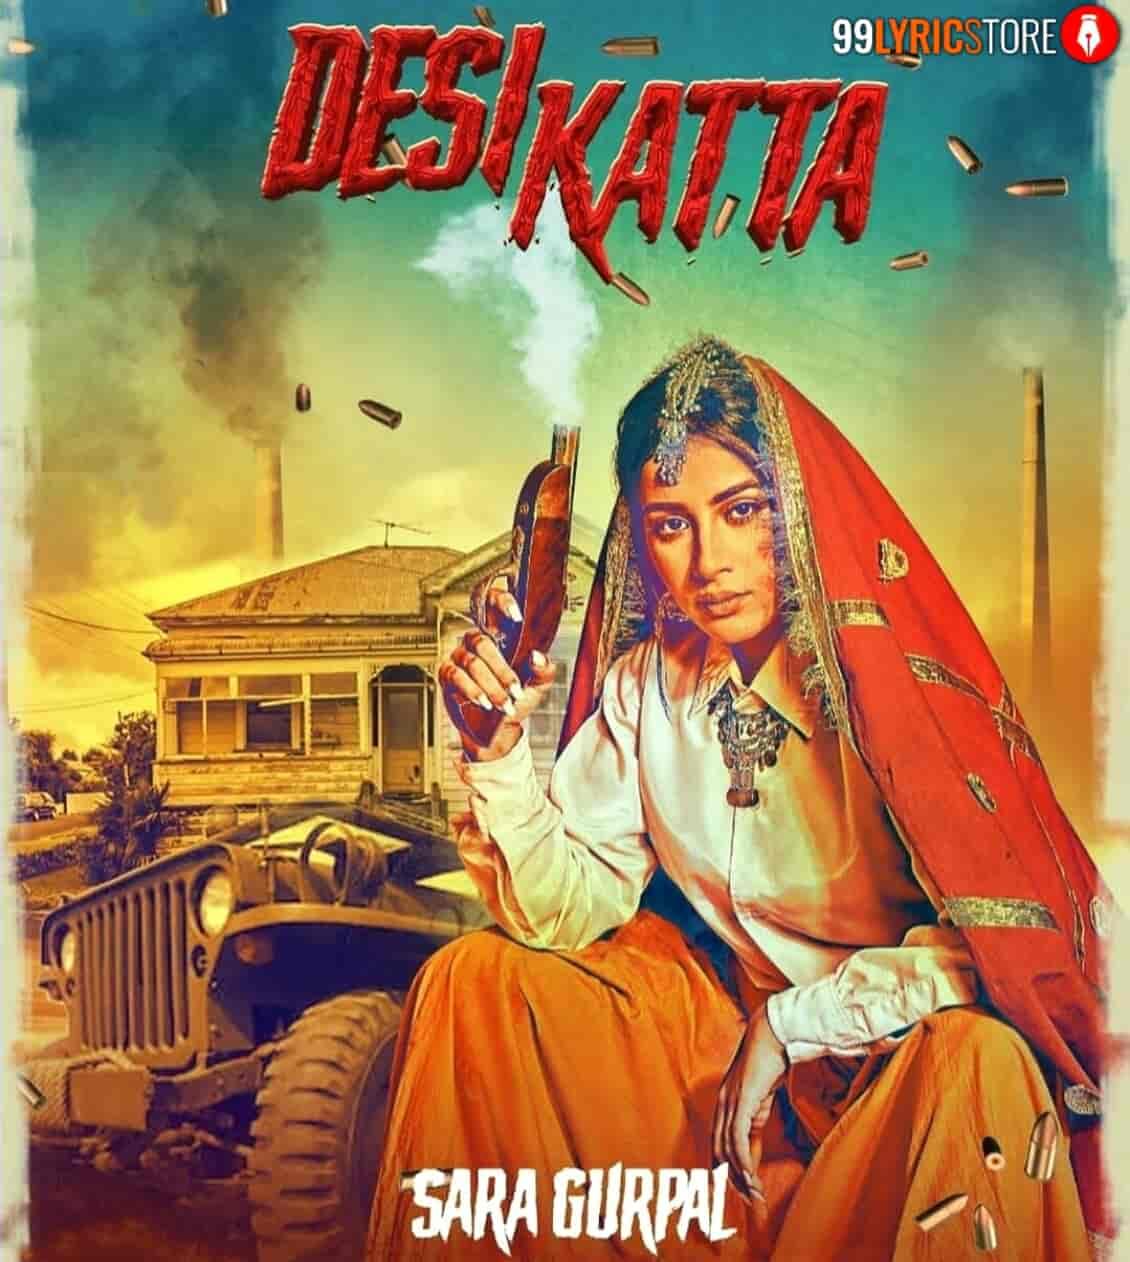 Desi Katta Lyrics Images Sara Gurpal